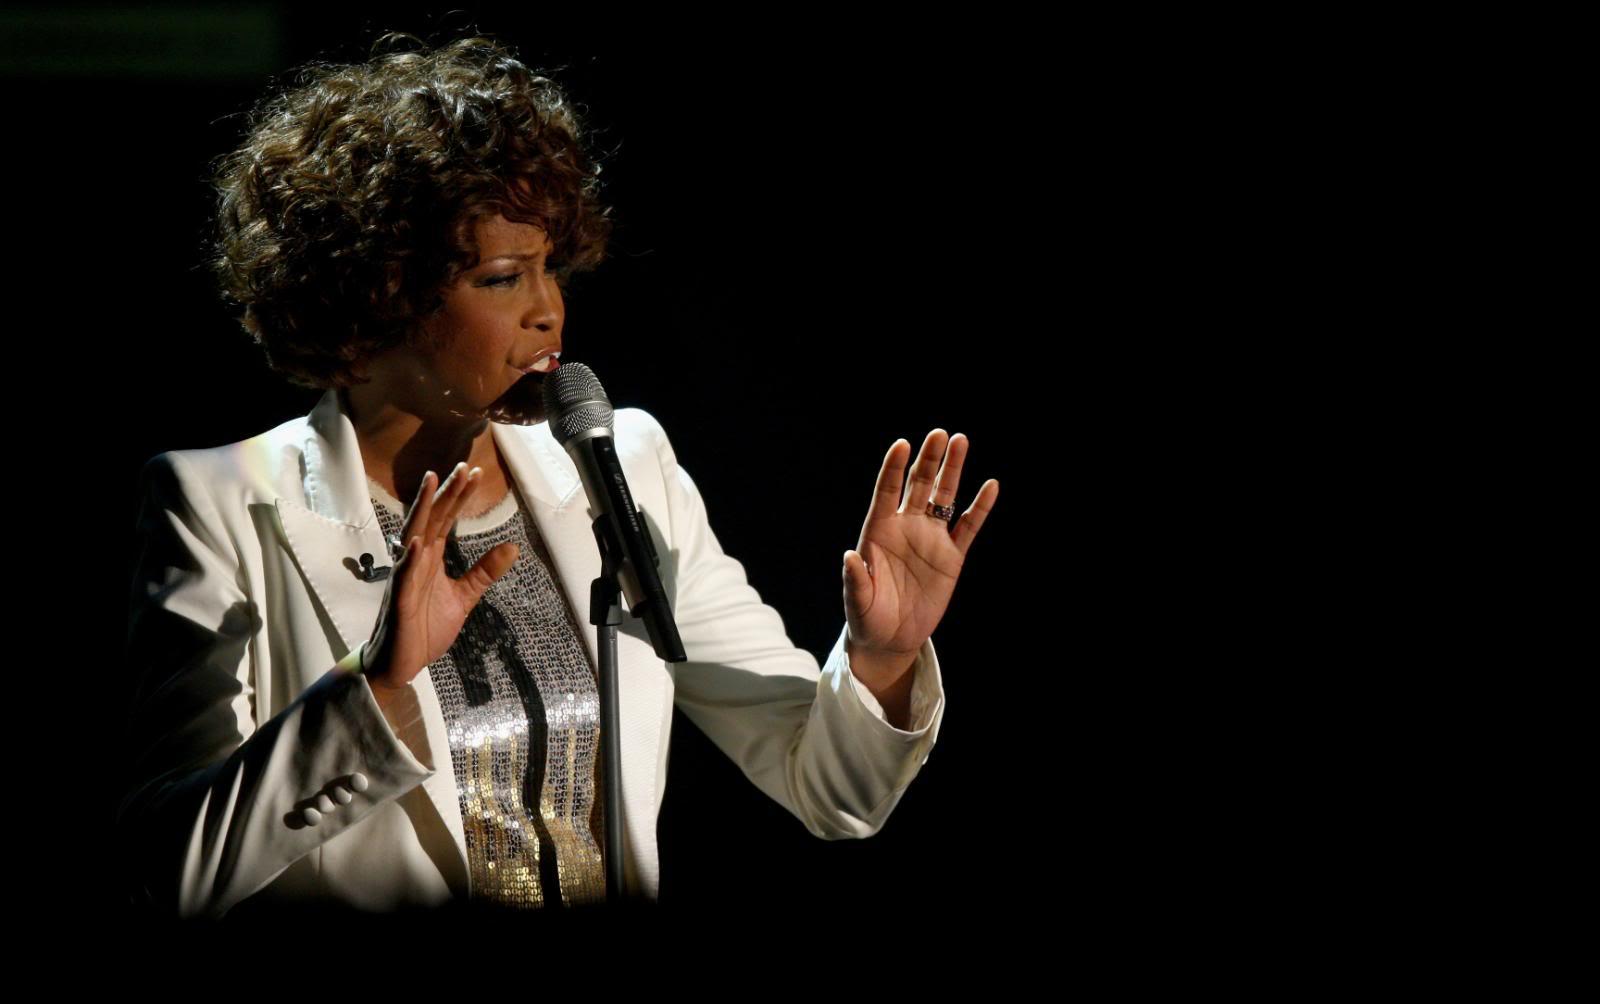 Whitney Houston 1963 – 2012 (HAND ANALYSIS) Whi1